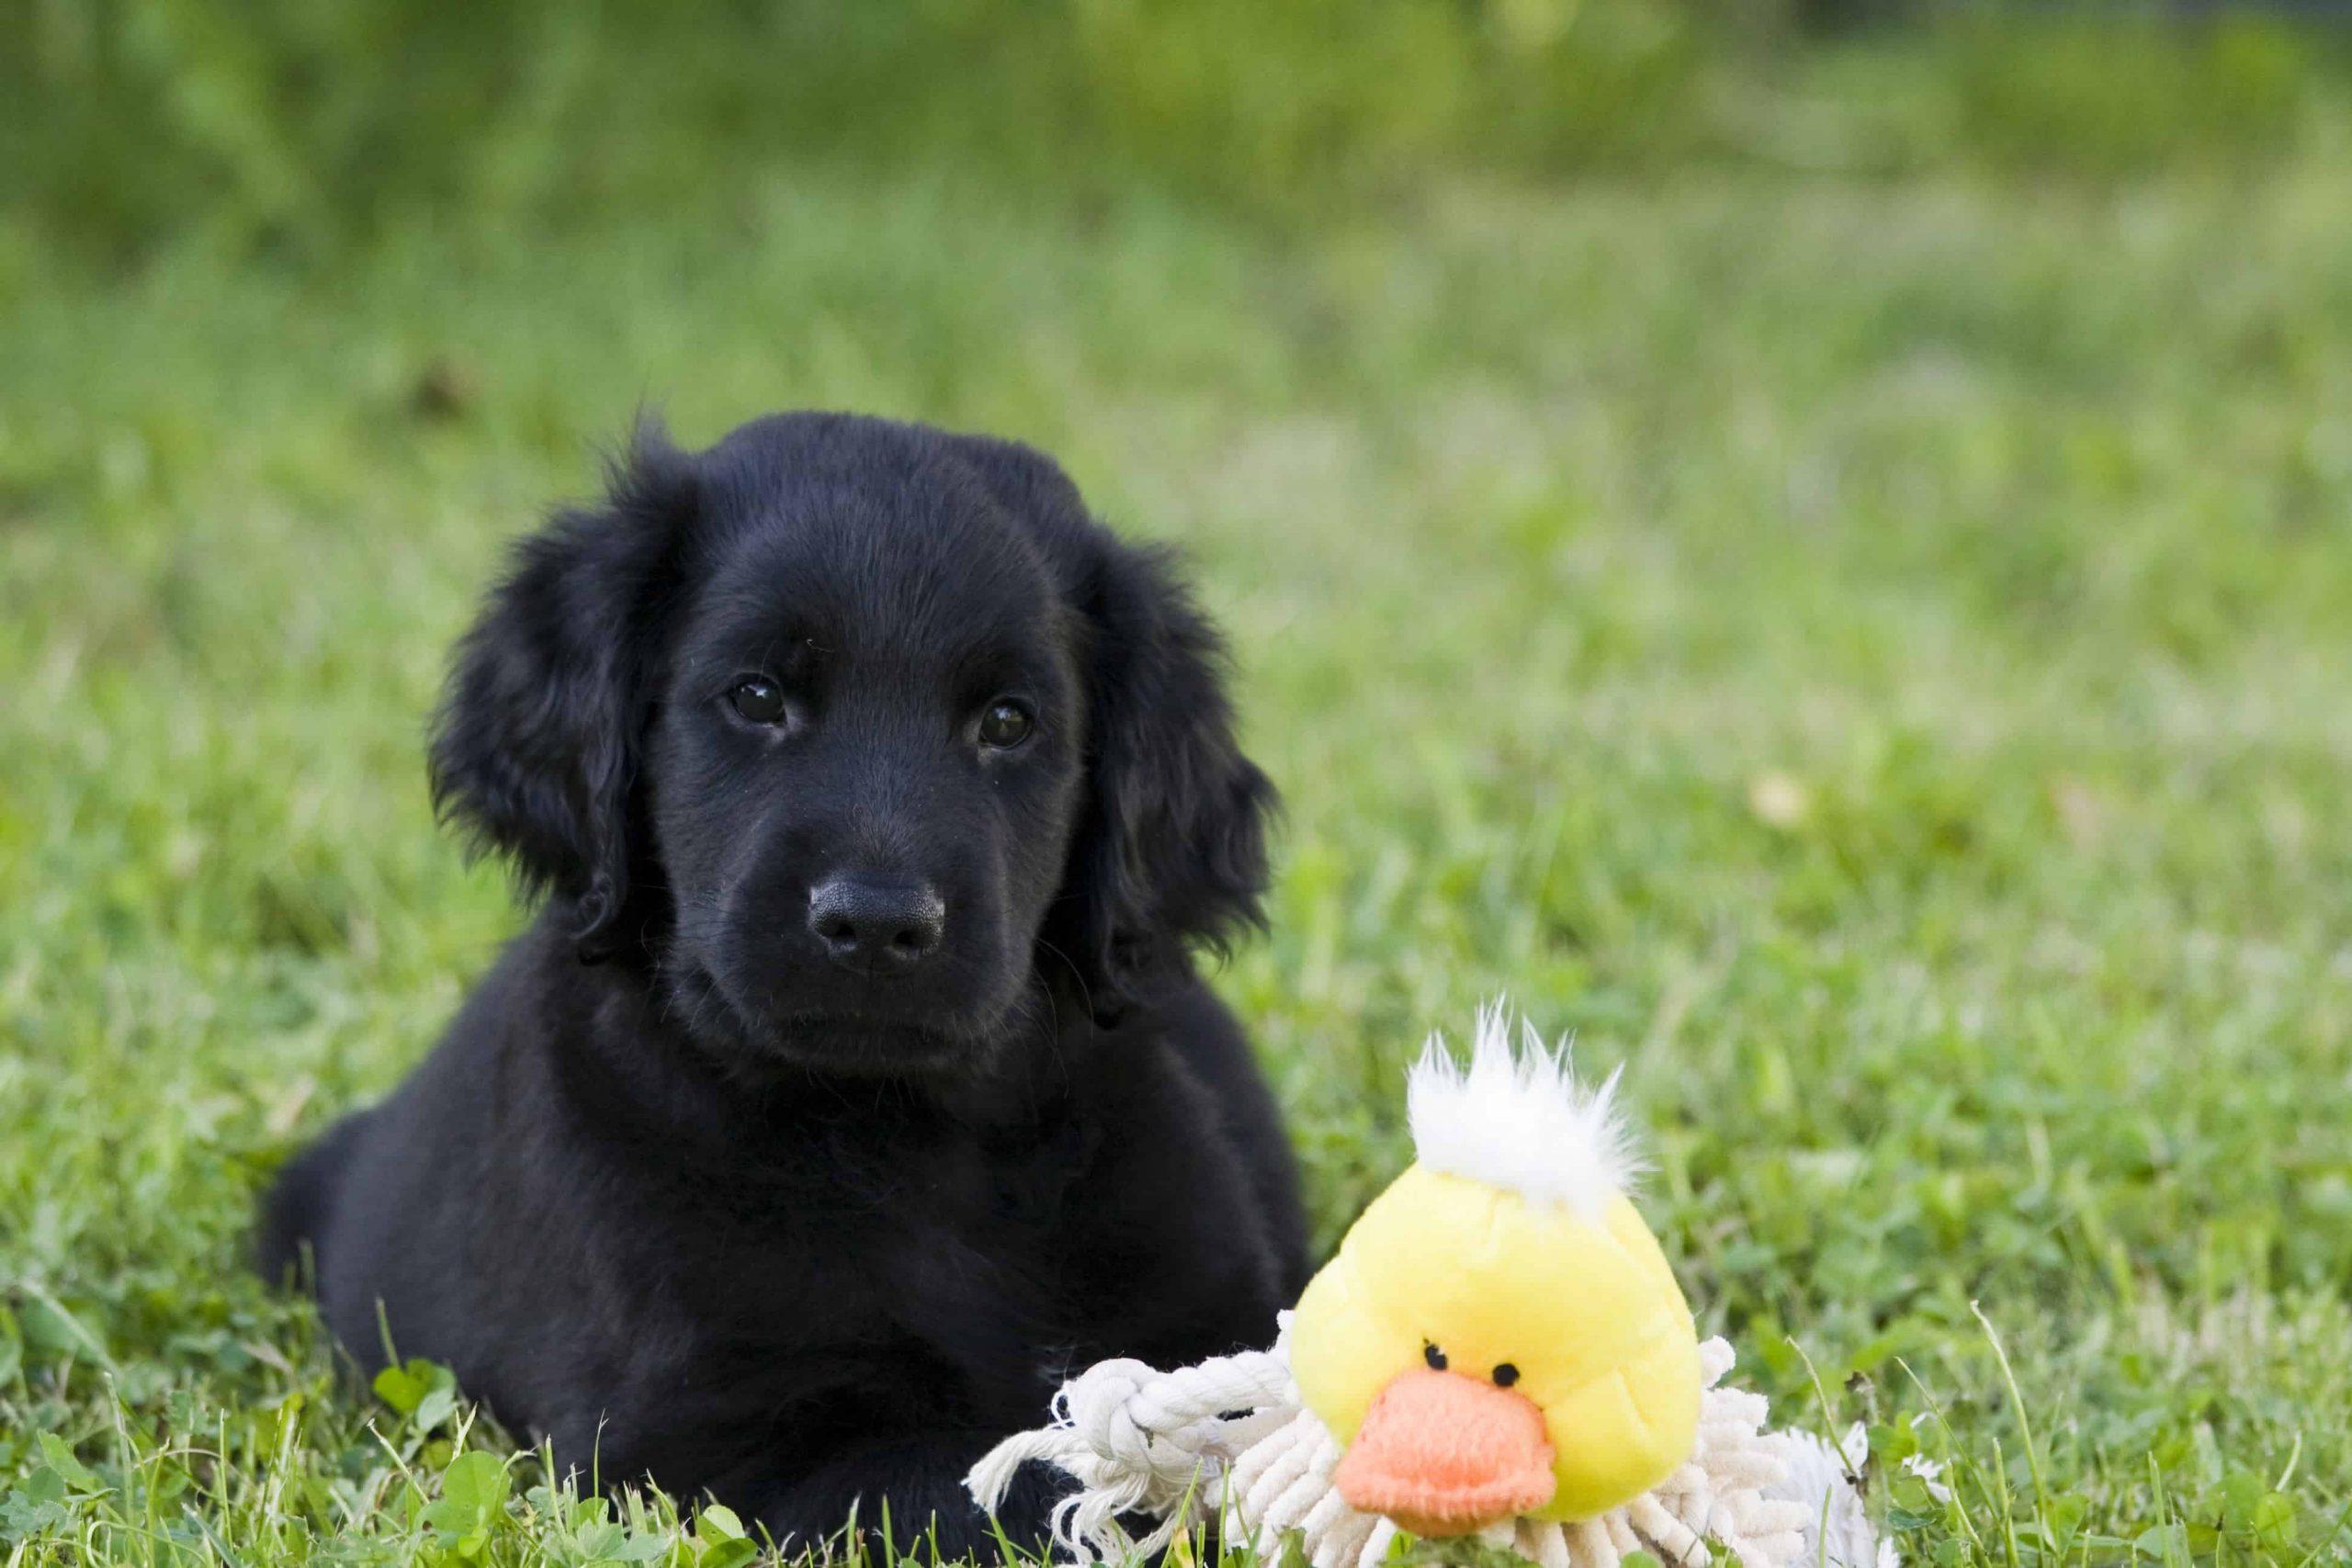 puppy-dog-animal-cute-pet-mammal-748378-pxhere.com_-scaled